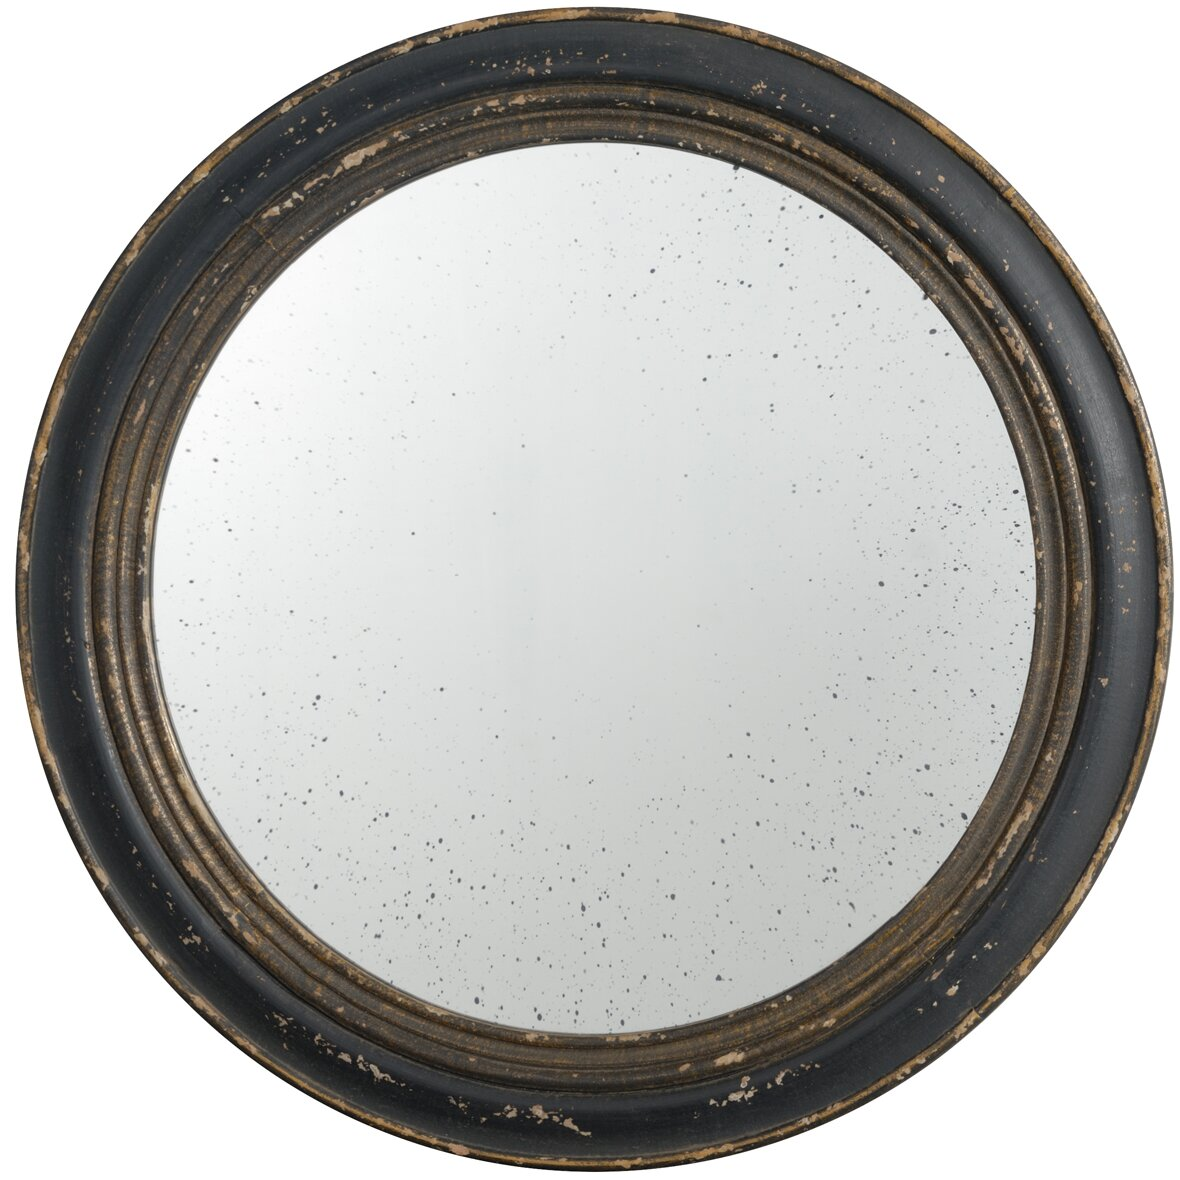 A b home round wall mirror reviews wayfair for Miroir 3 pans